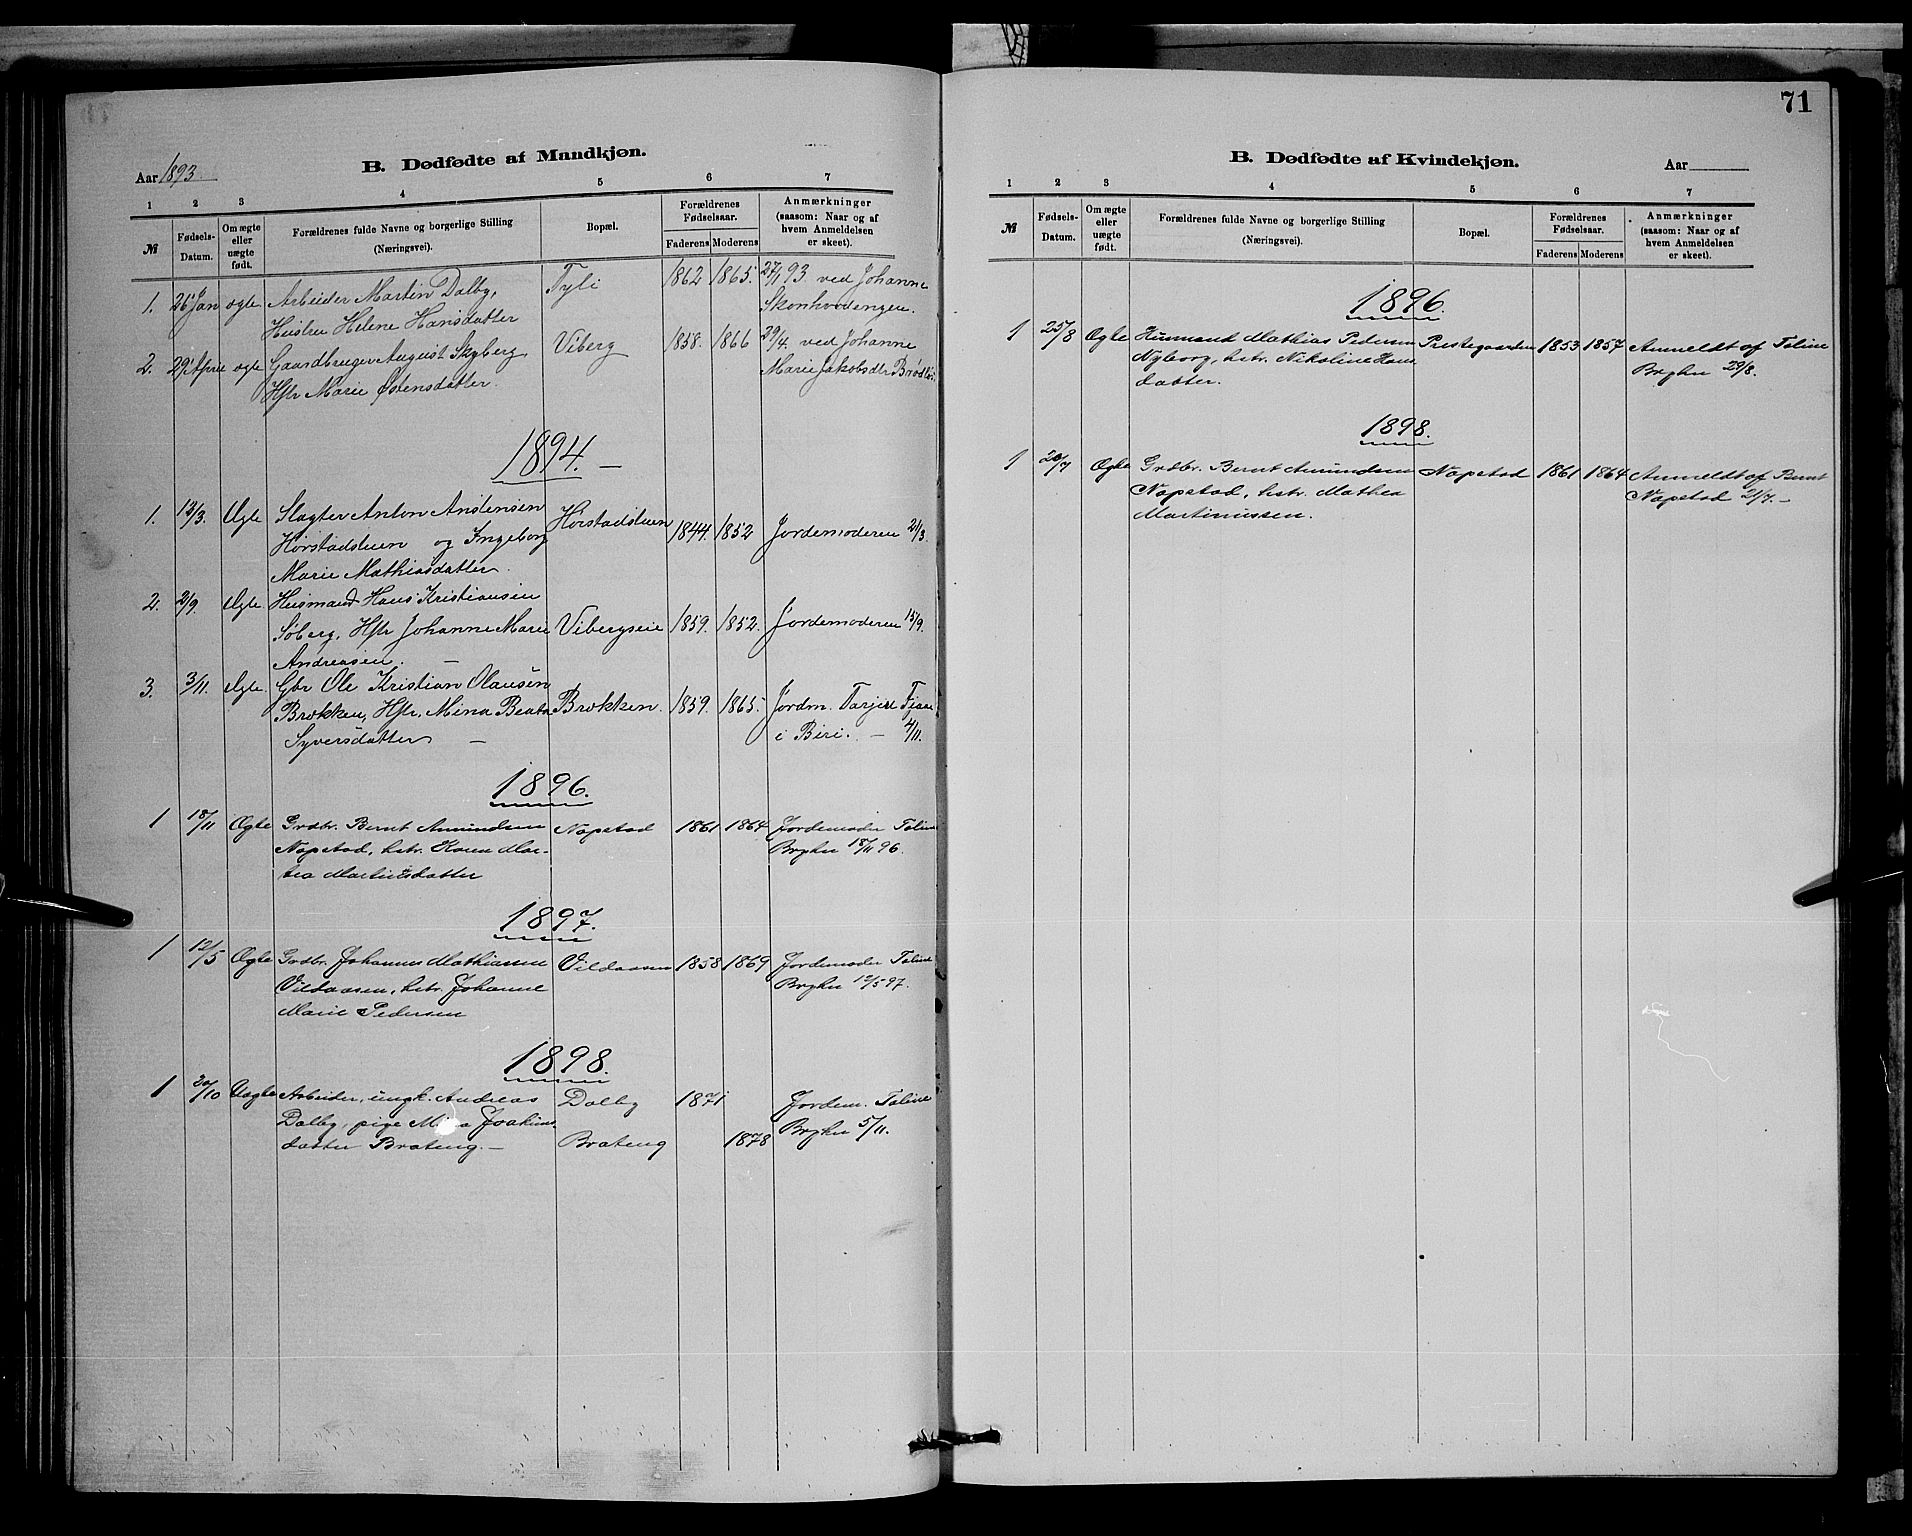 SAH, Vardal prestekontor, H/Ha/Hab/L0008: Klokkerbok nr. 8, 1881-1898, s. 71